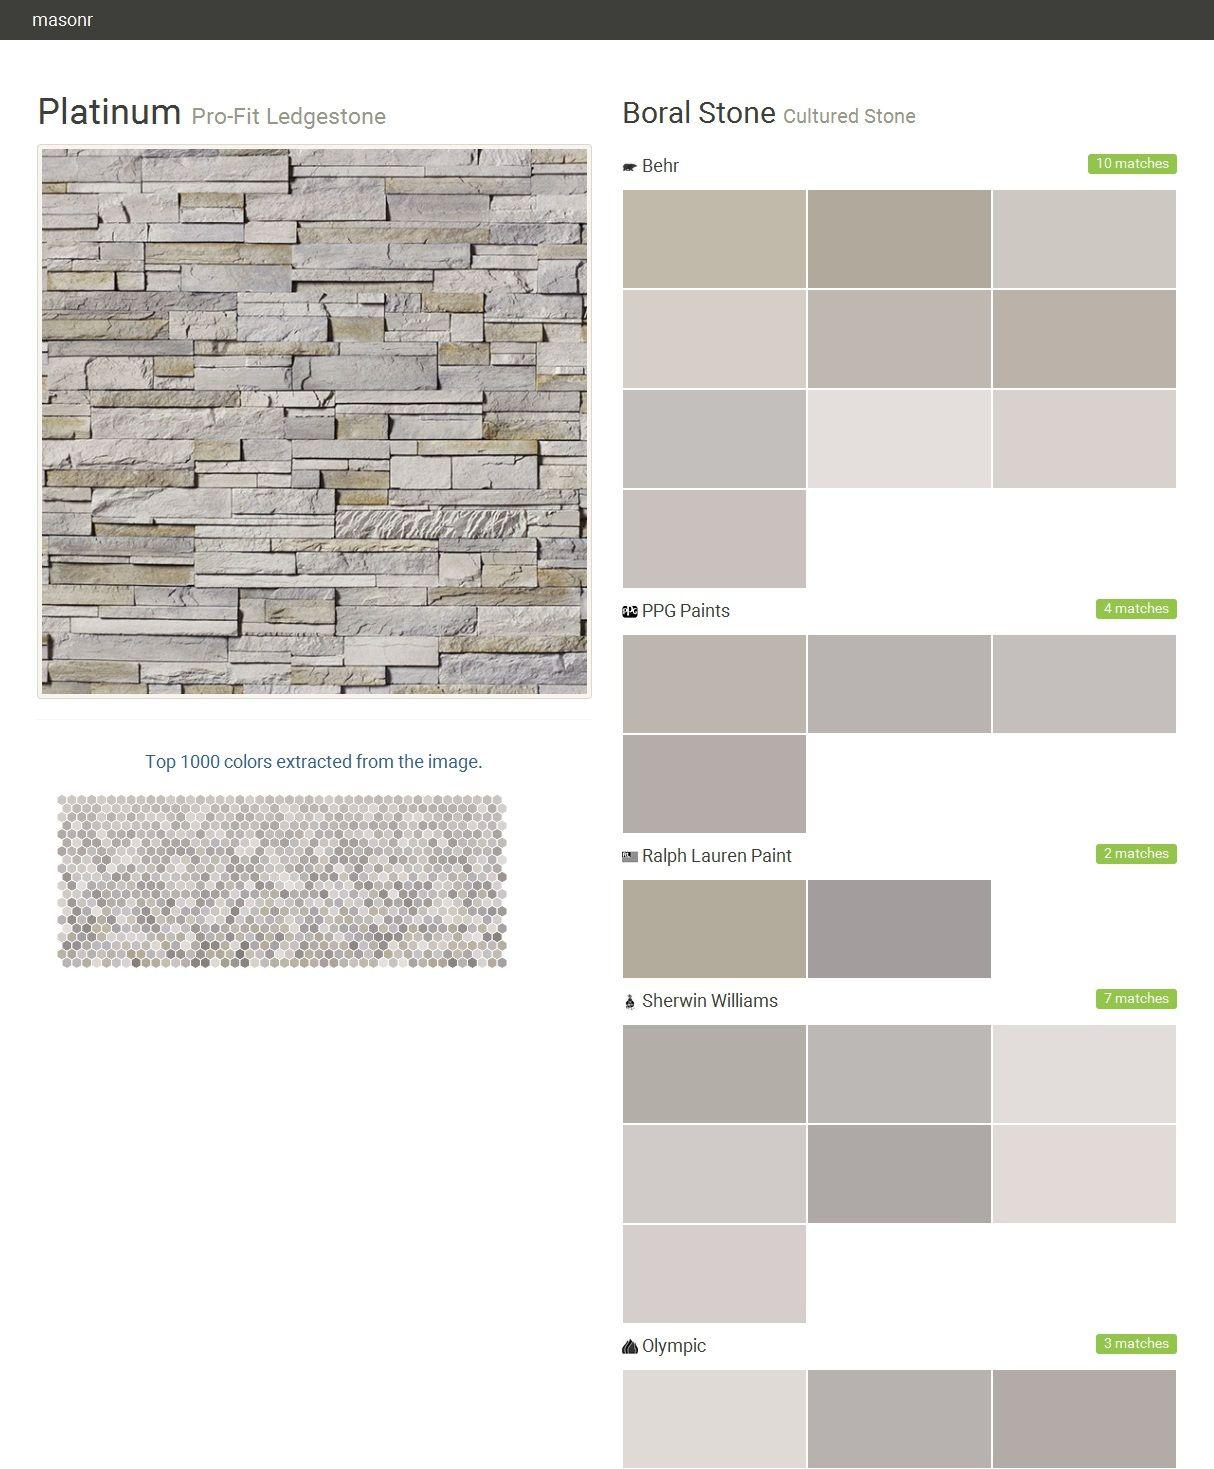 Platinum pro fit ledgestone cultured stone boral stone for Behr pro paint